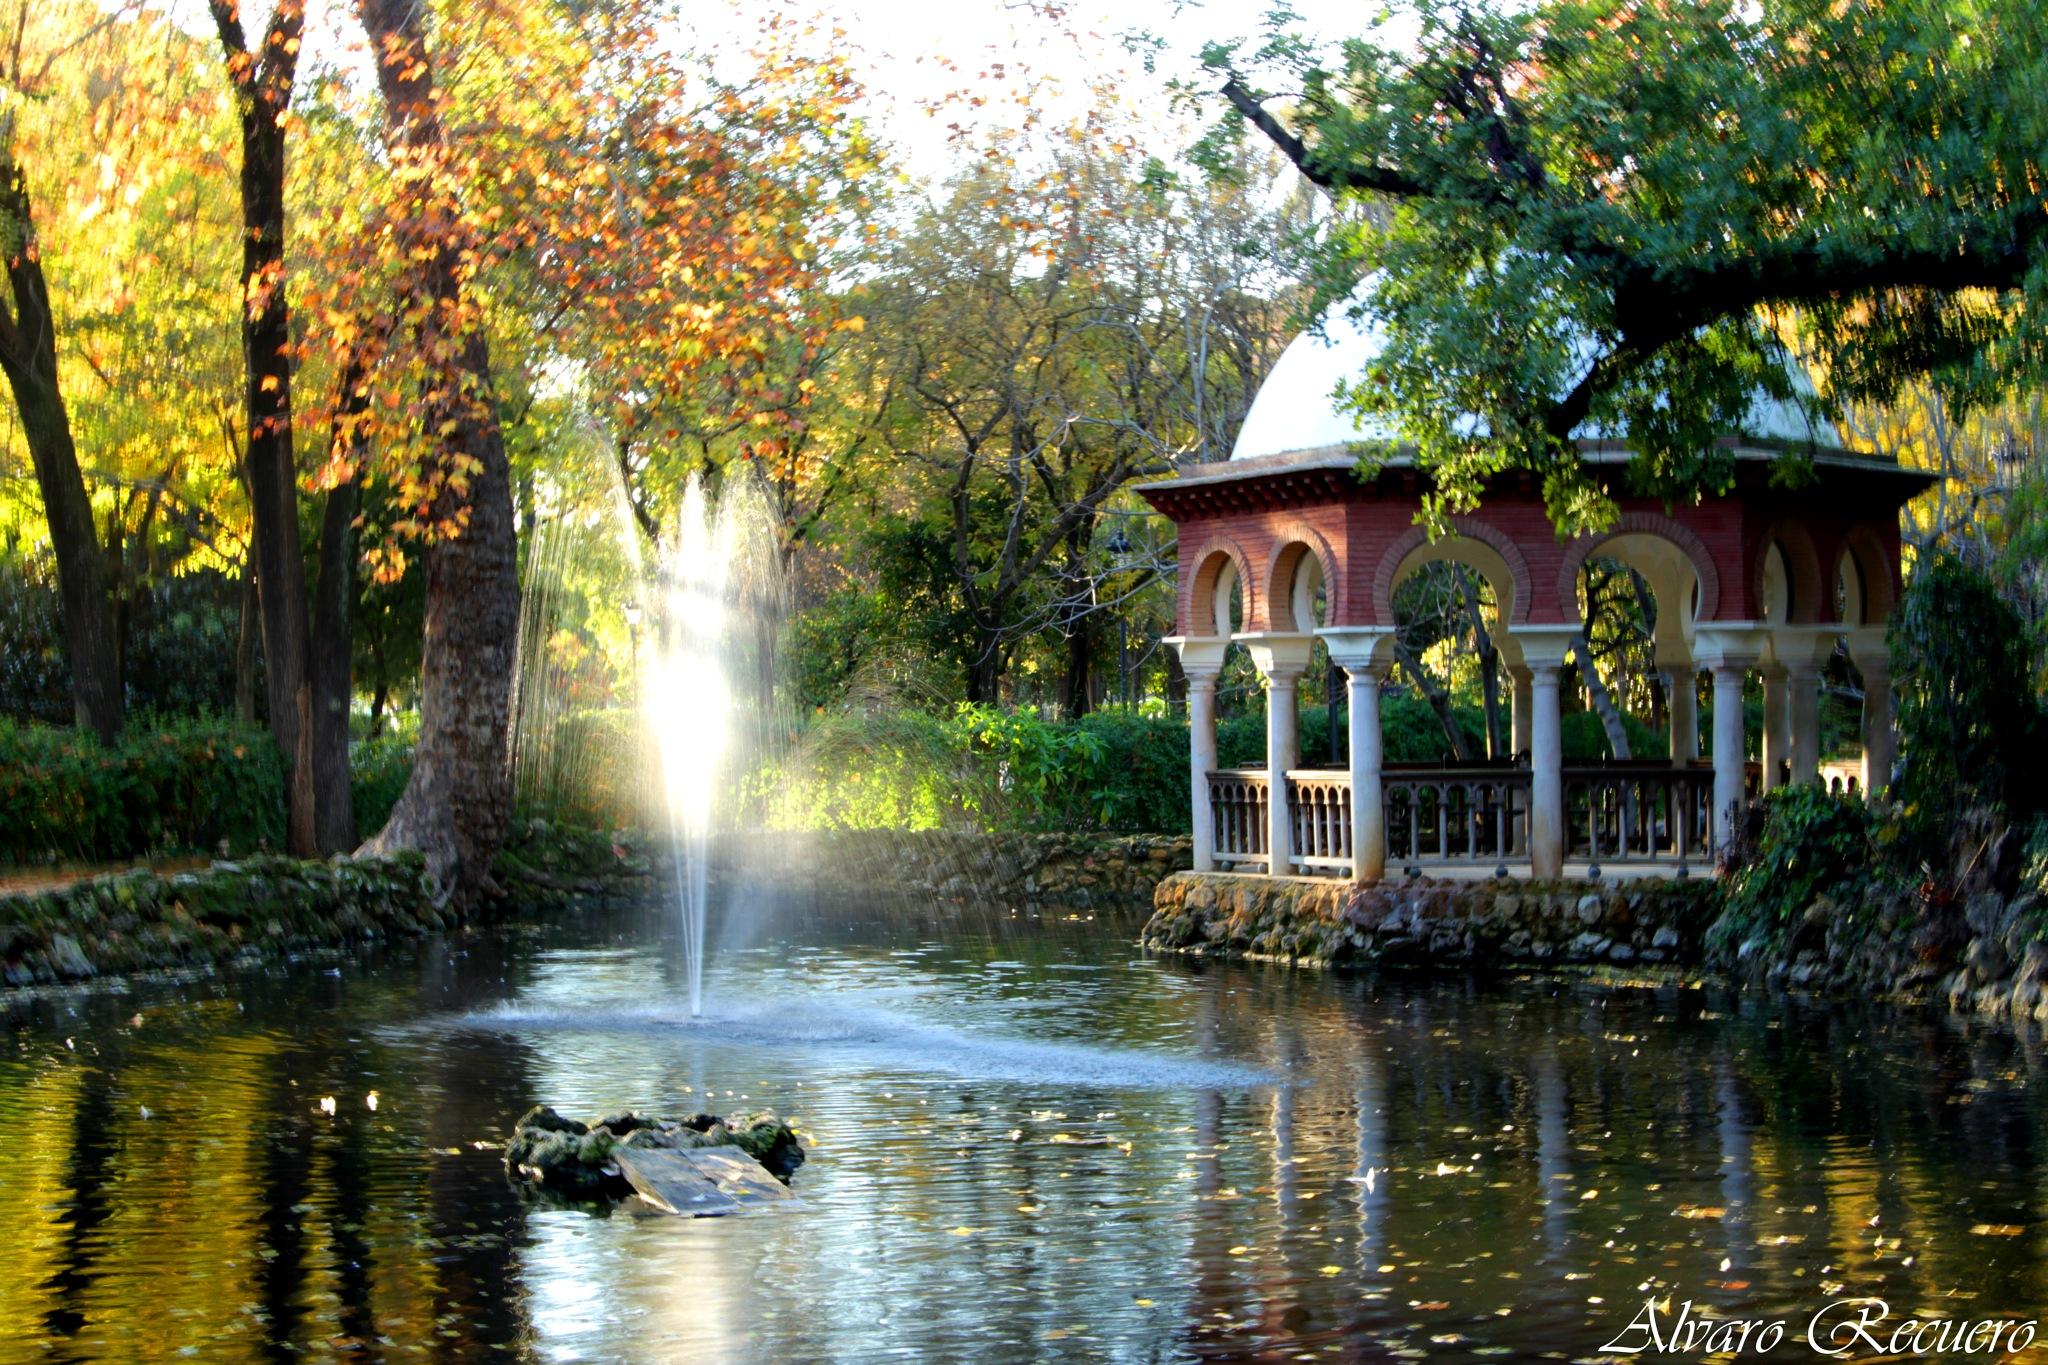 Autumn park by Alvaro Recuero